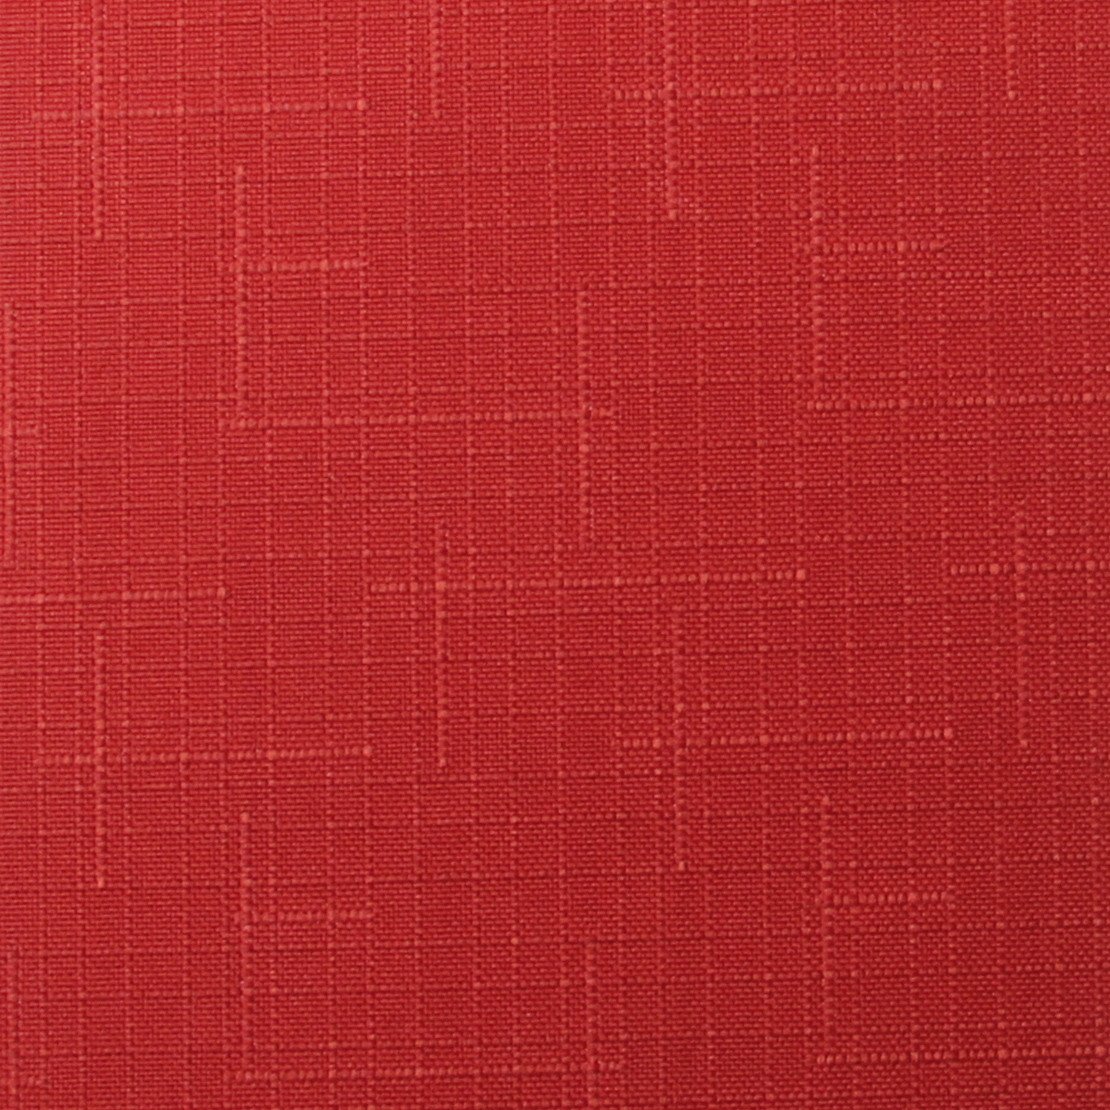 Рулонные шторы Ткань Лён 888 Вишнёвый